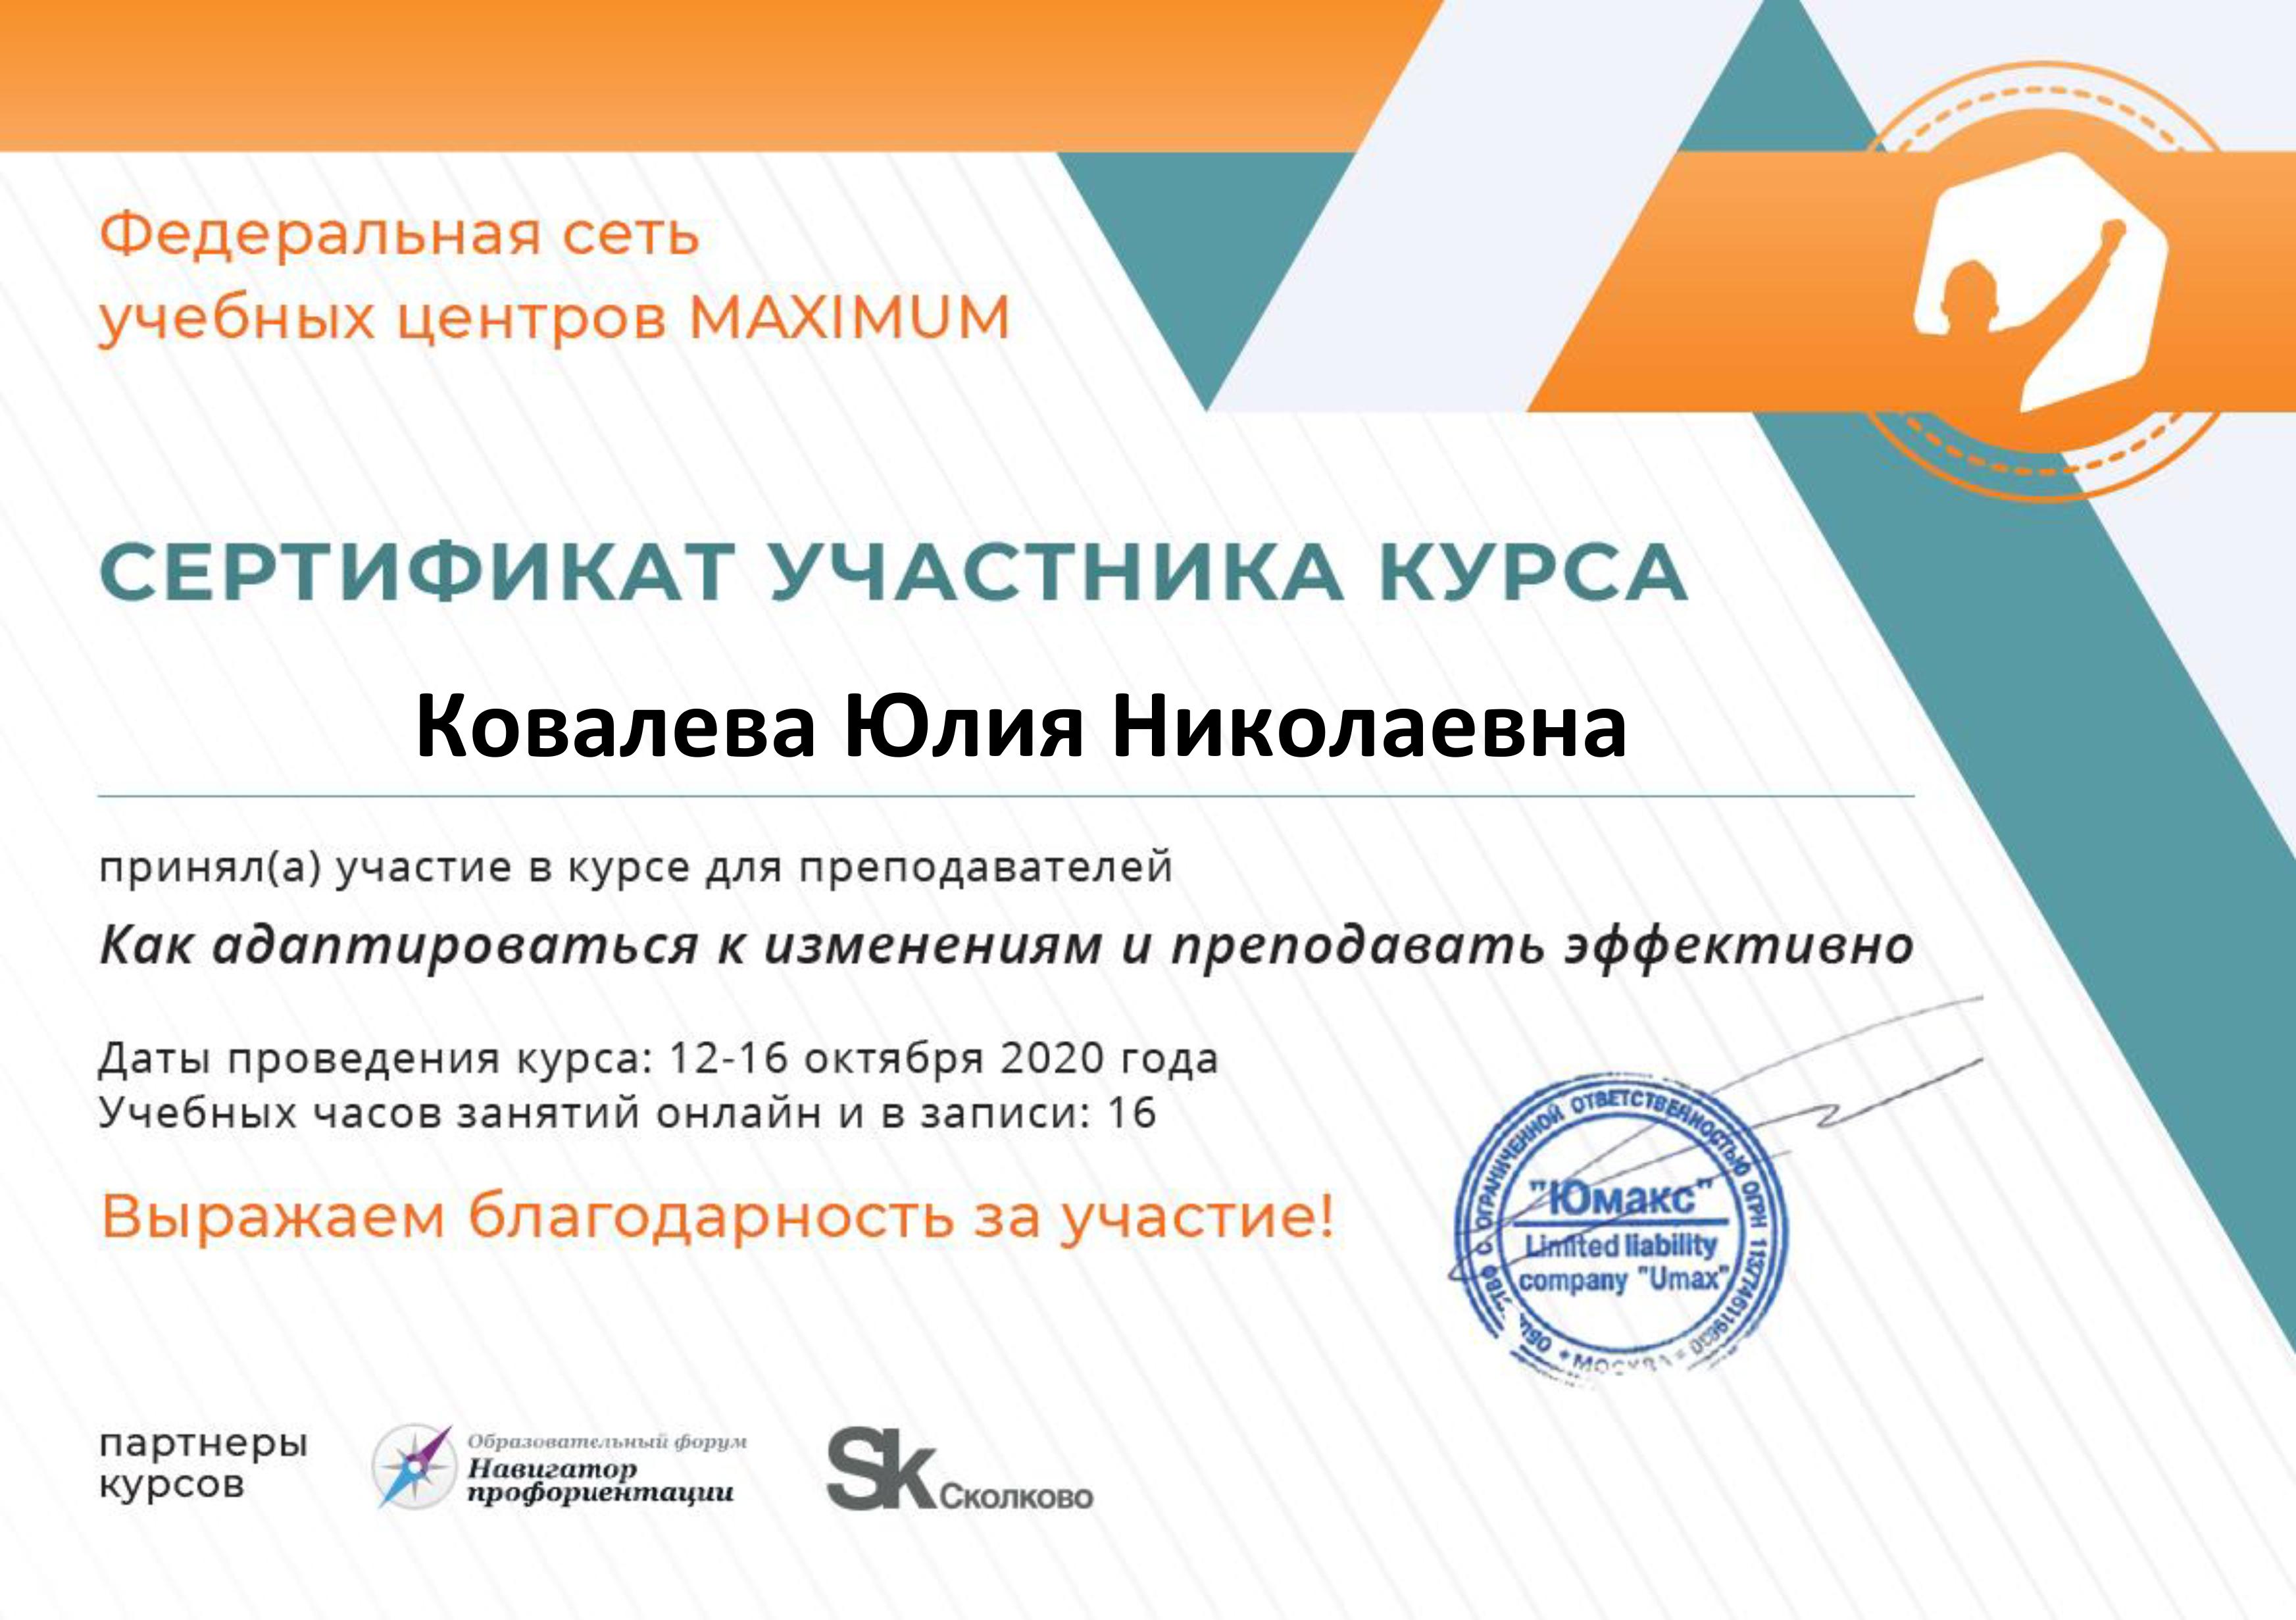 Сертификат Максимум